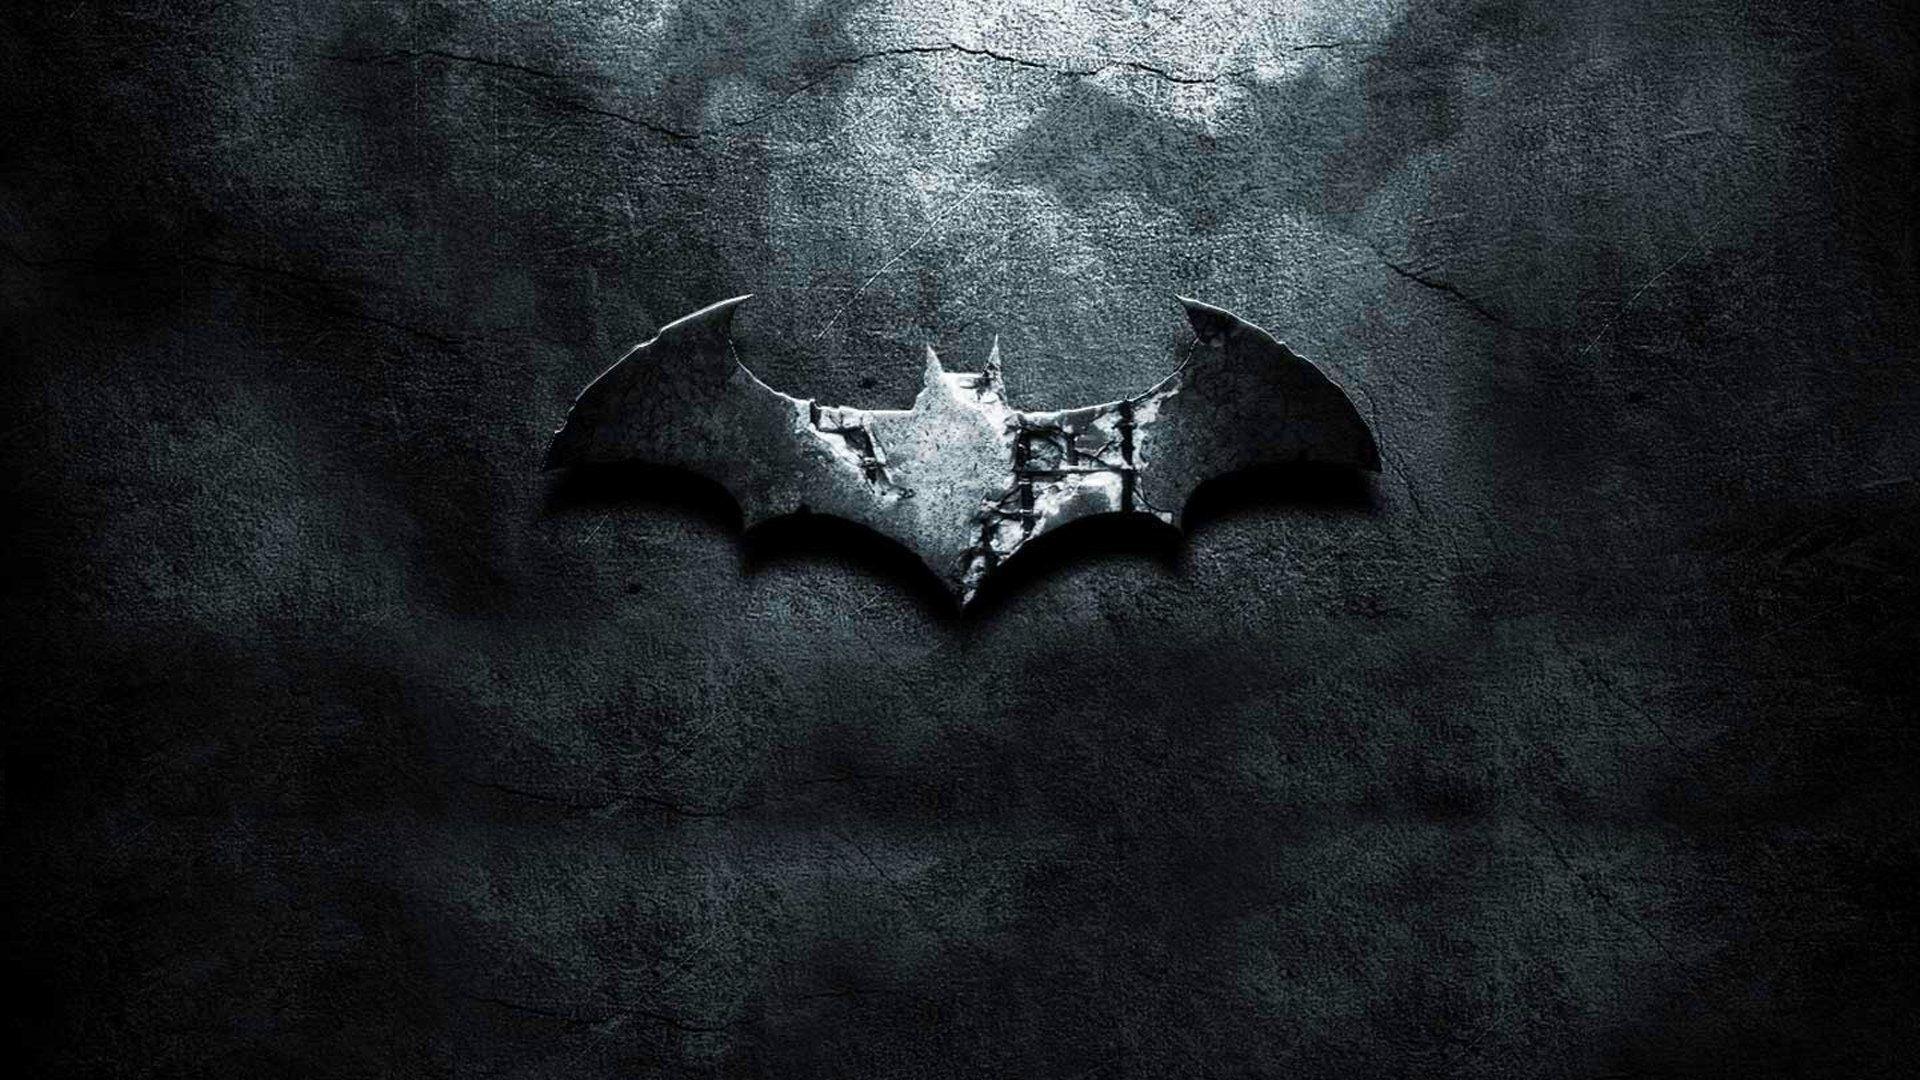 1920x1080 Wallpapers For Batman Logo Wallpaper Hd 1080p